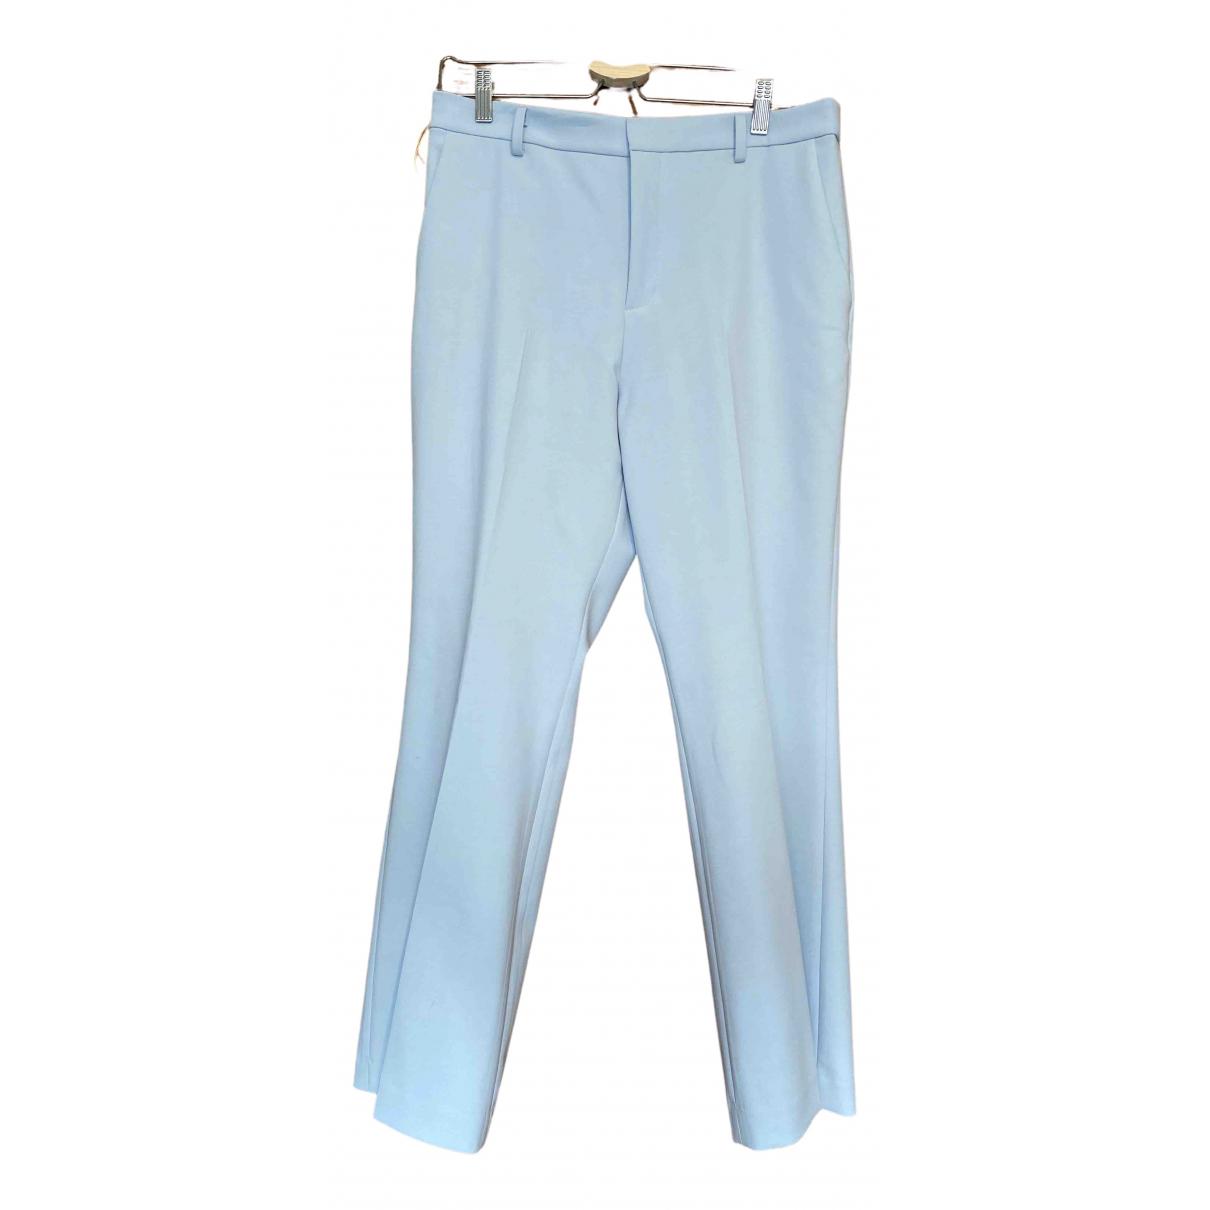 Uniqlo \N Blue Trousers for Women L International